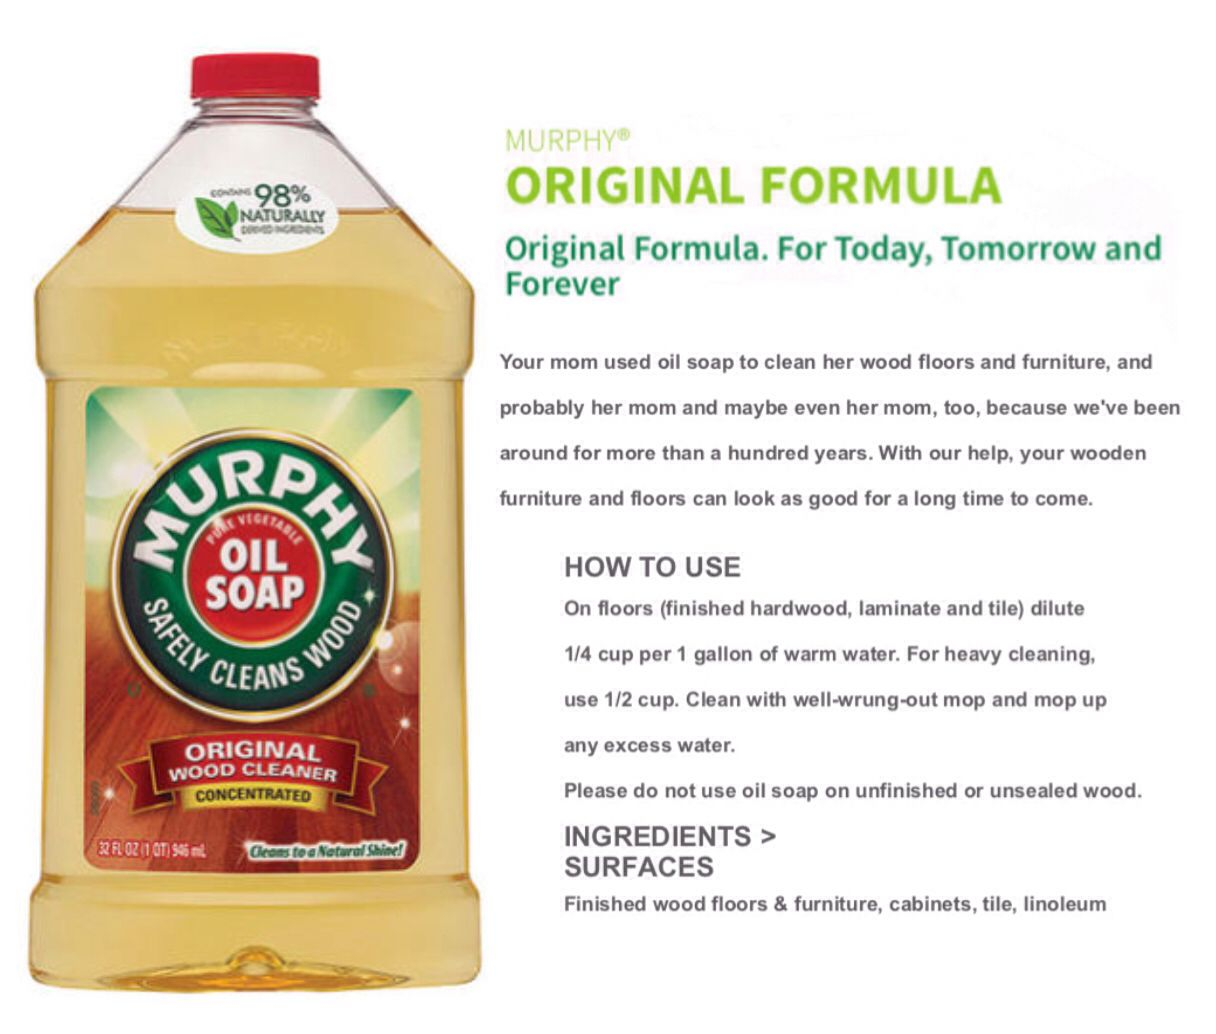 Murphy Oil Soap Reviews